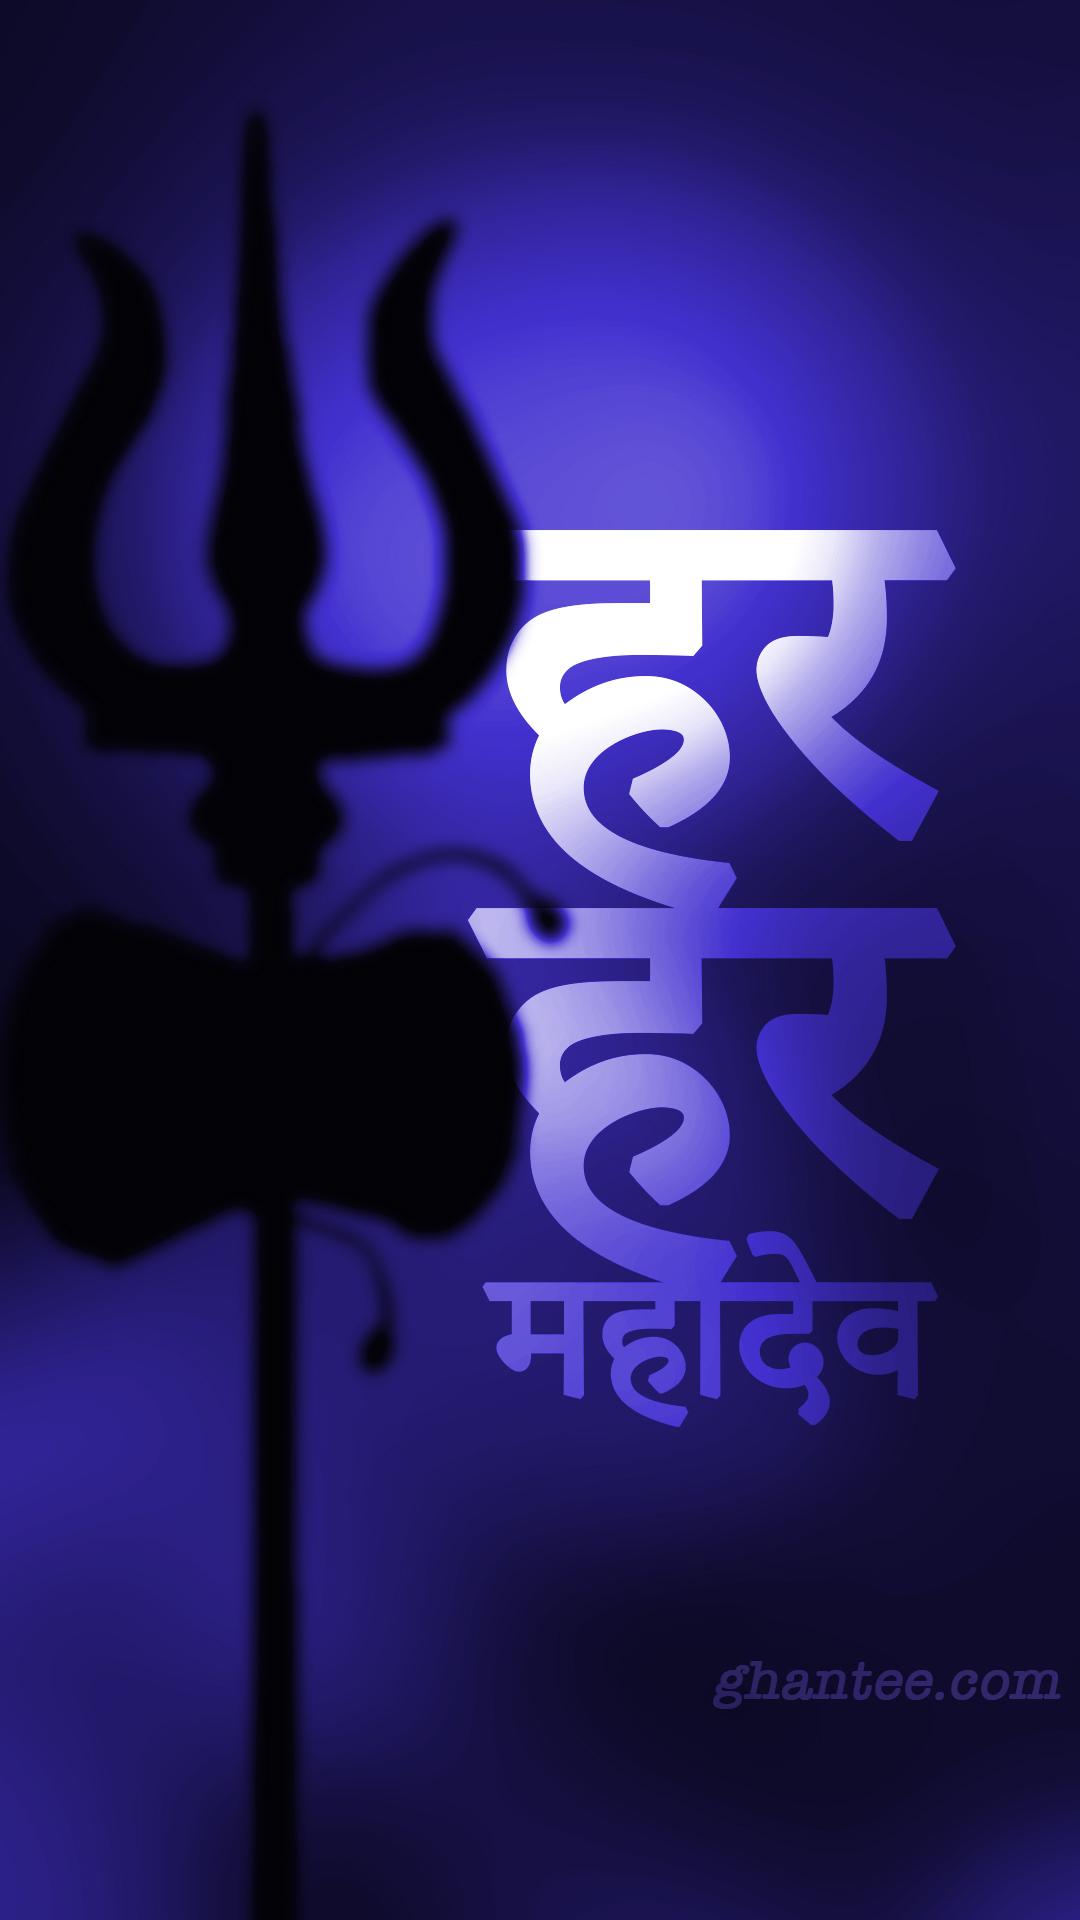 har har mahadev hindi style phone wallpaper4